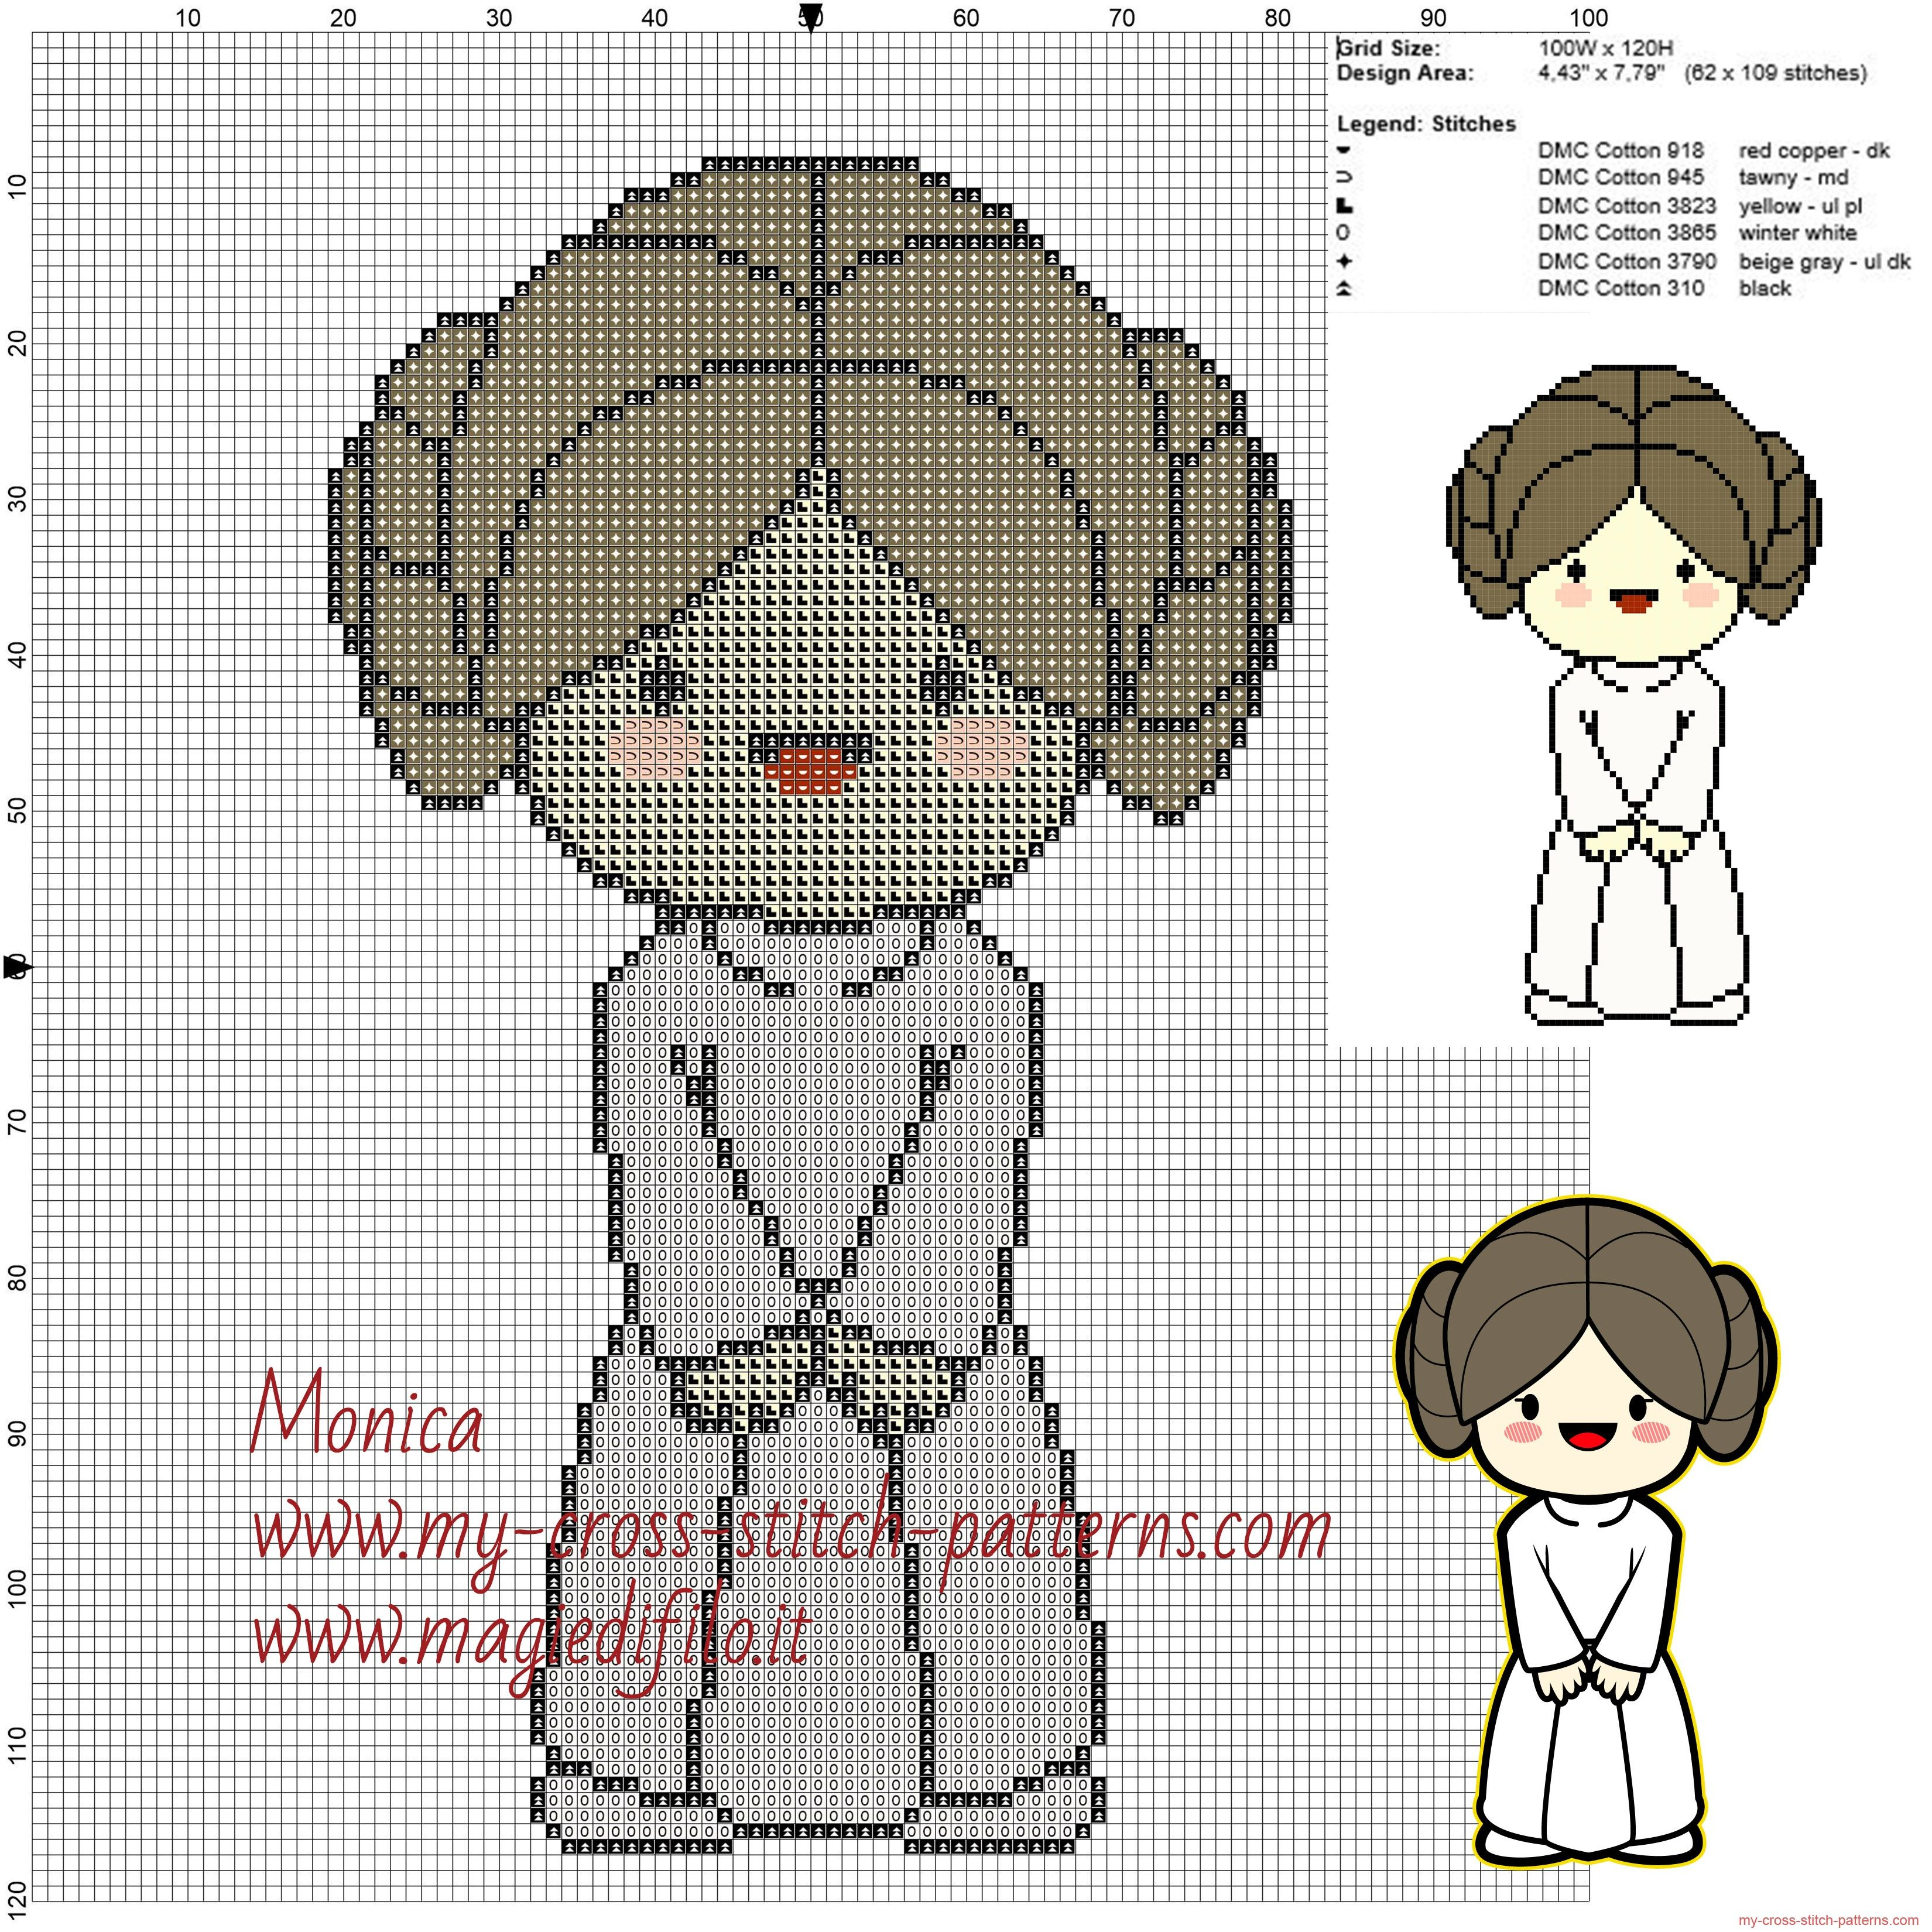 Princess Leia (Star Wars) cross stitch pattern | Bebés y Niños PX ...